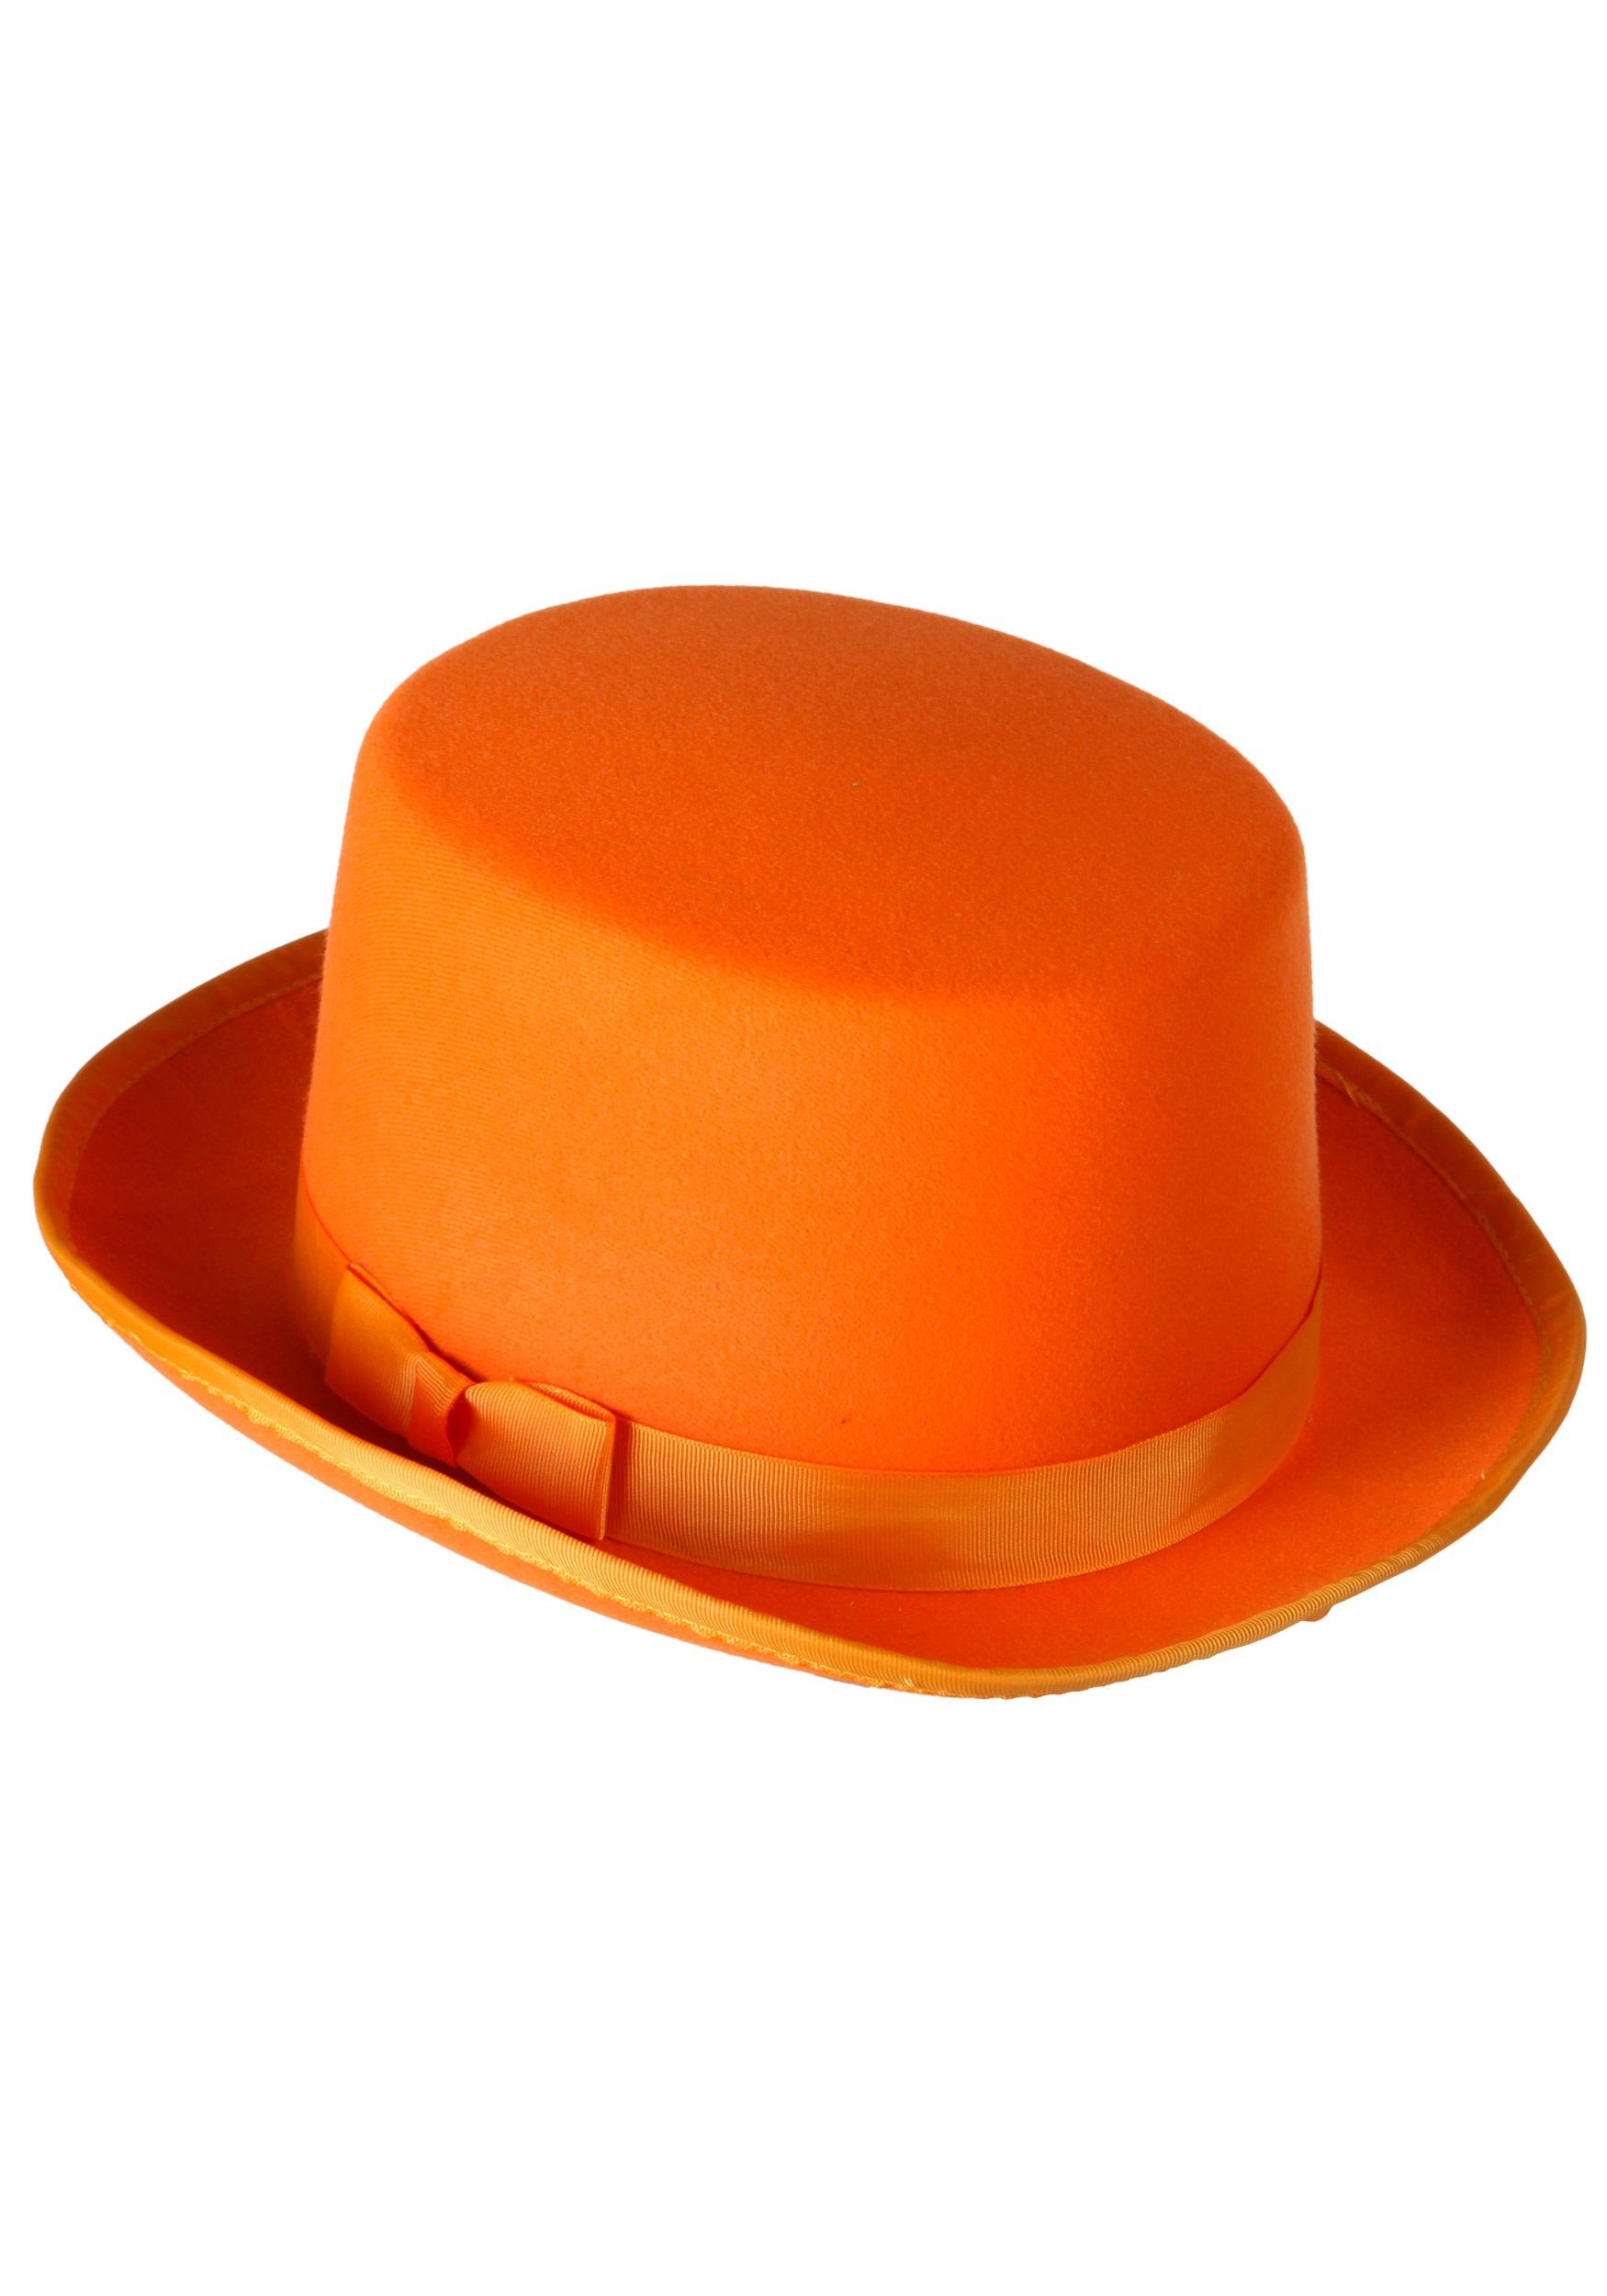 Orange_Tuxedo_Top_Hat